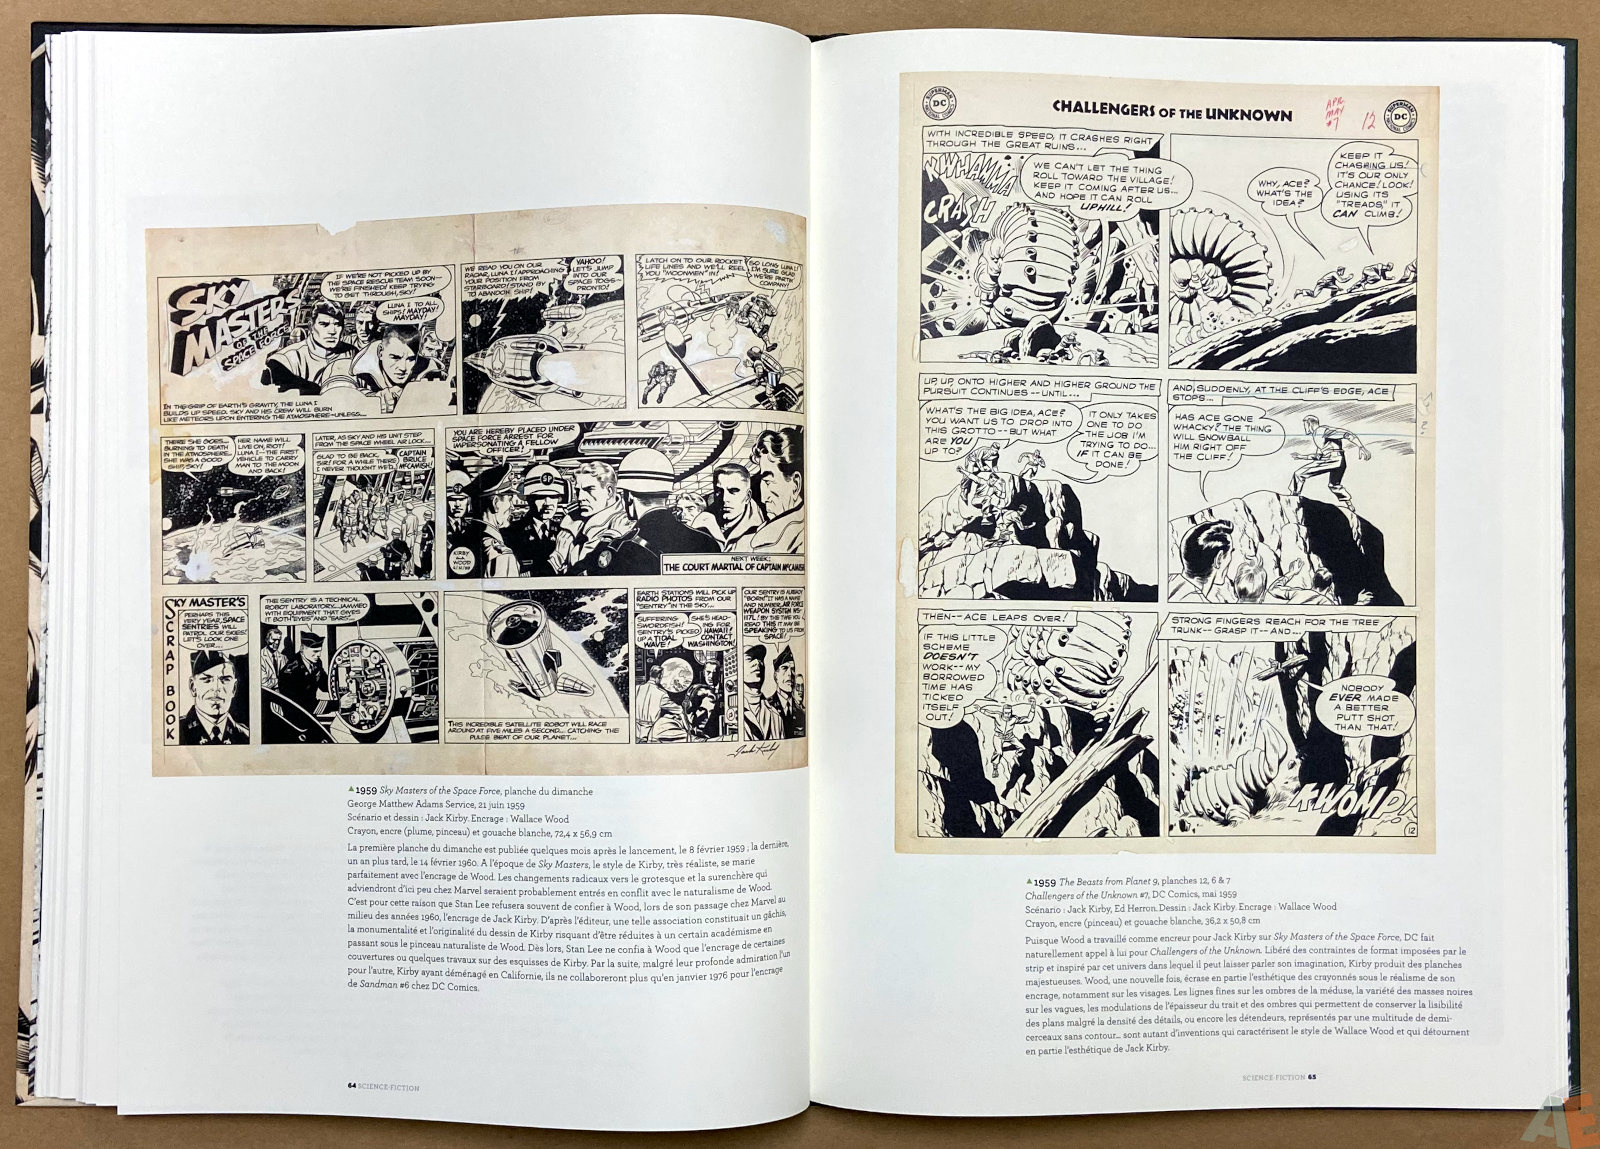 Les Mondes De Wallace Wood catalogue interior 7